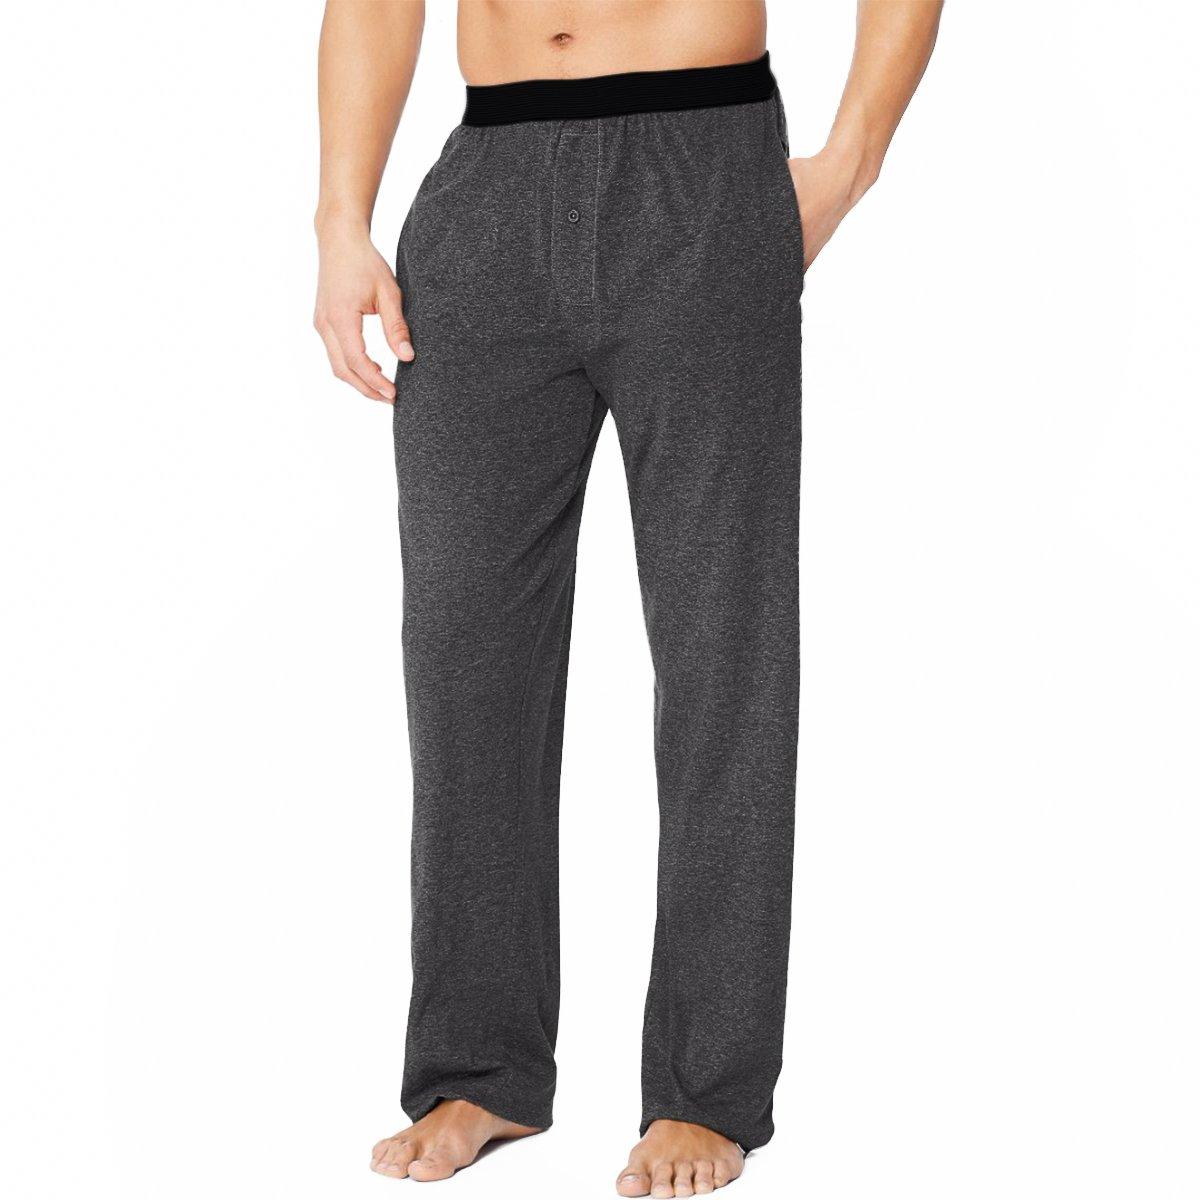 Ecko Mens Small Cotton Blend Pajamas Pants For Men Soft Comfortable Lightweight